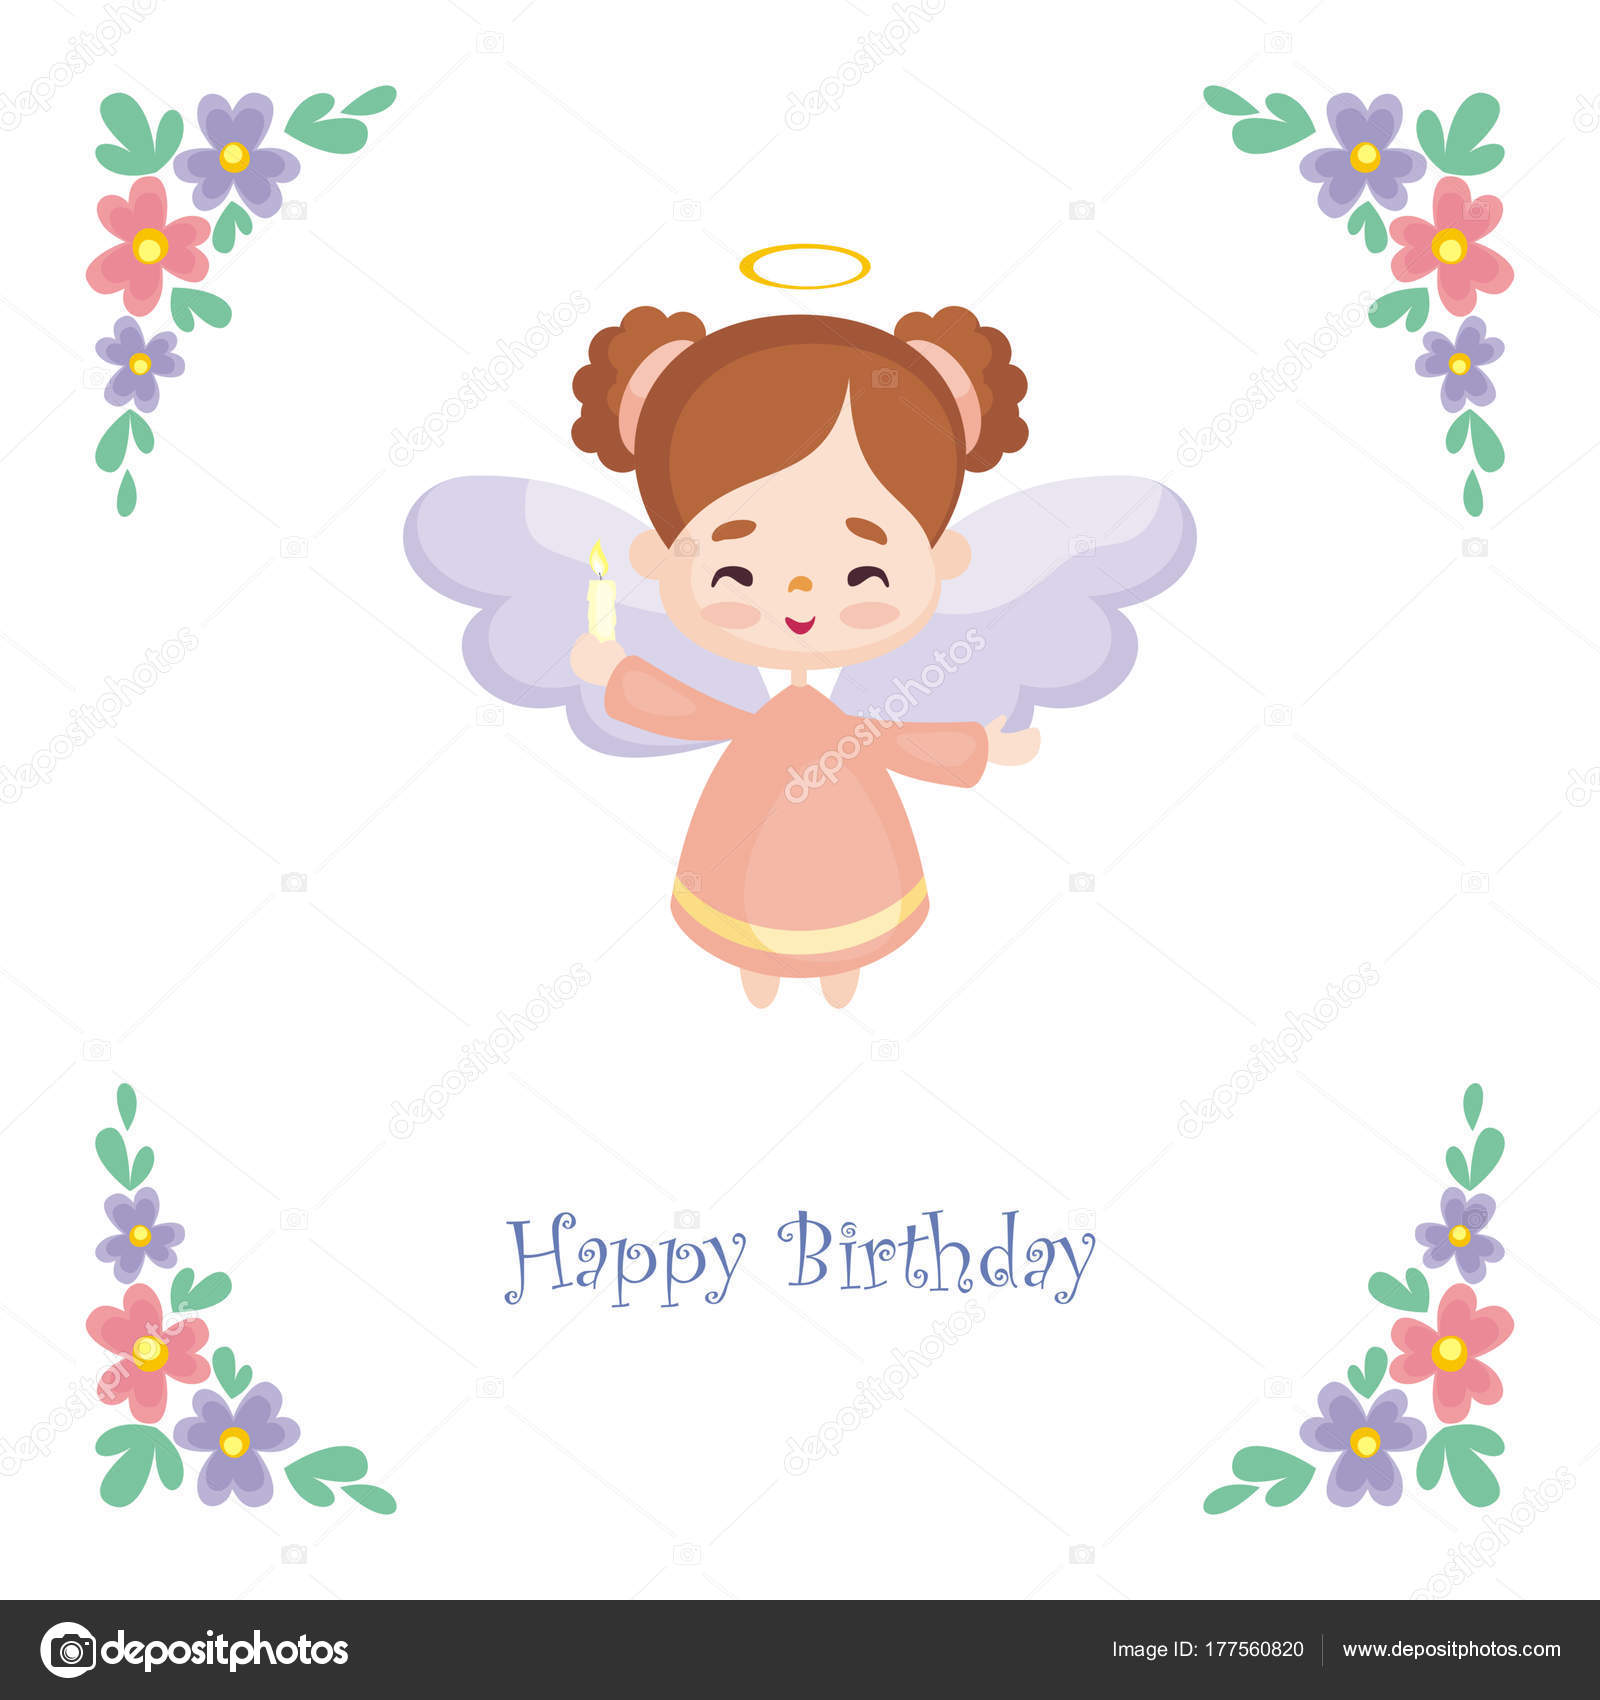 Birthday greeting card image pretty little angel vector illustration birthday greeting card image pretty little angel vector illustration white stock vector m4hsunfo